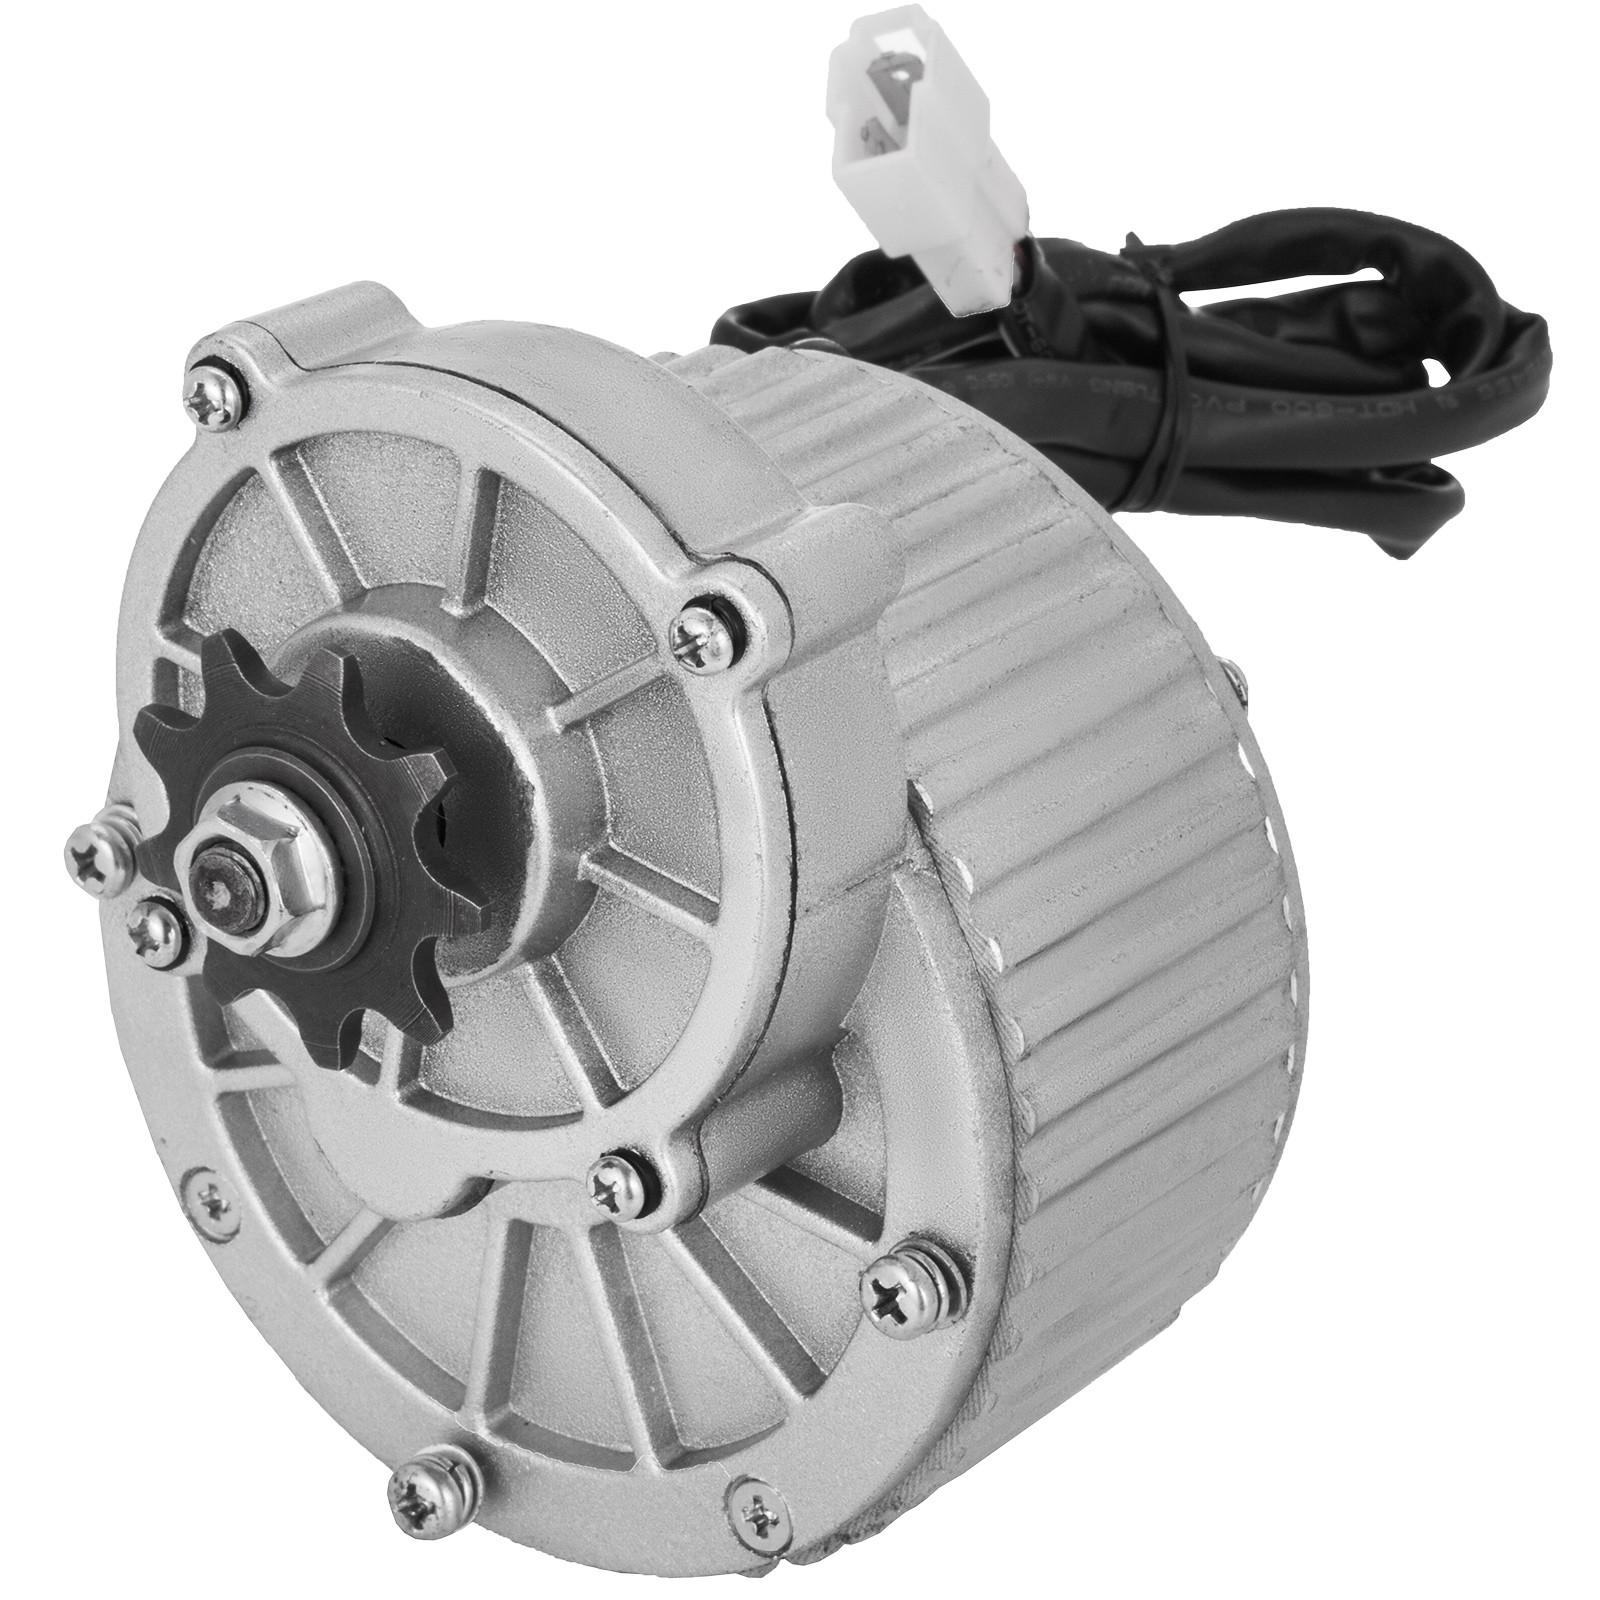 DC-electric-motor-12-60V-150W-2KW-for-scooter-bike-go-kart-minibike-e-ATV thumbnail 65